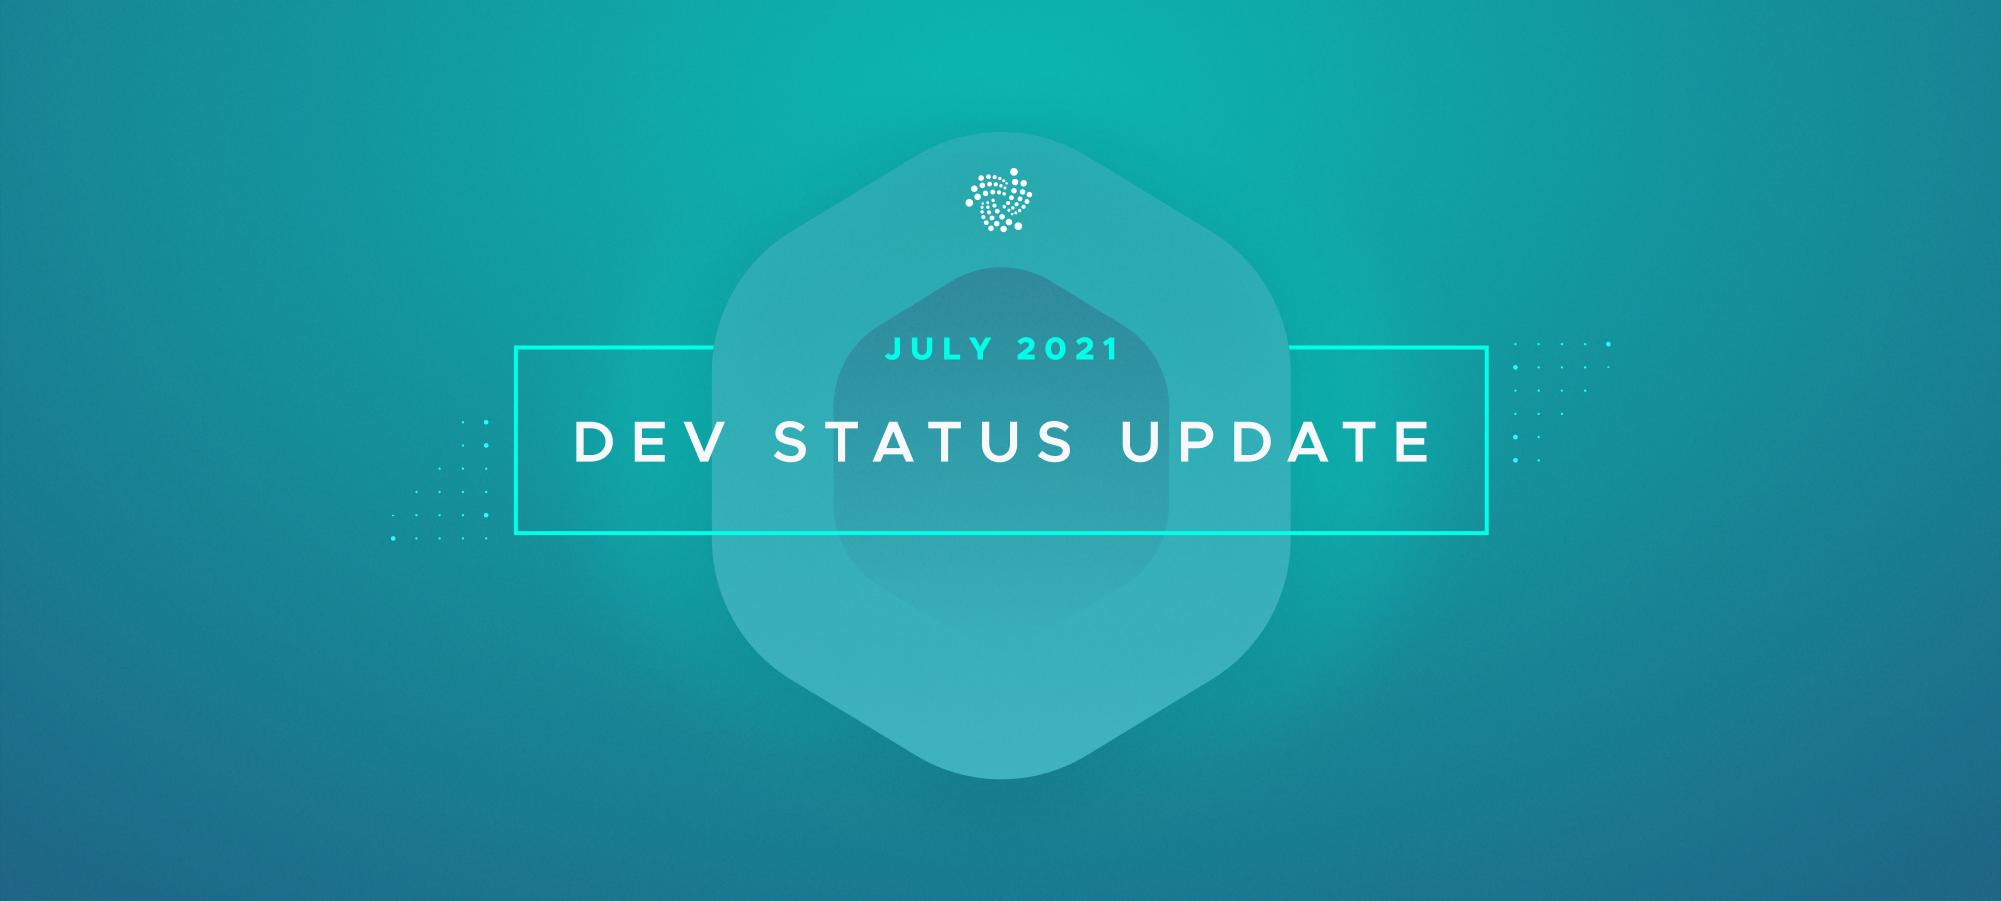 Dev Status Update - July, 2021